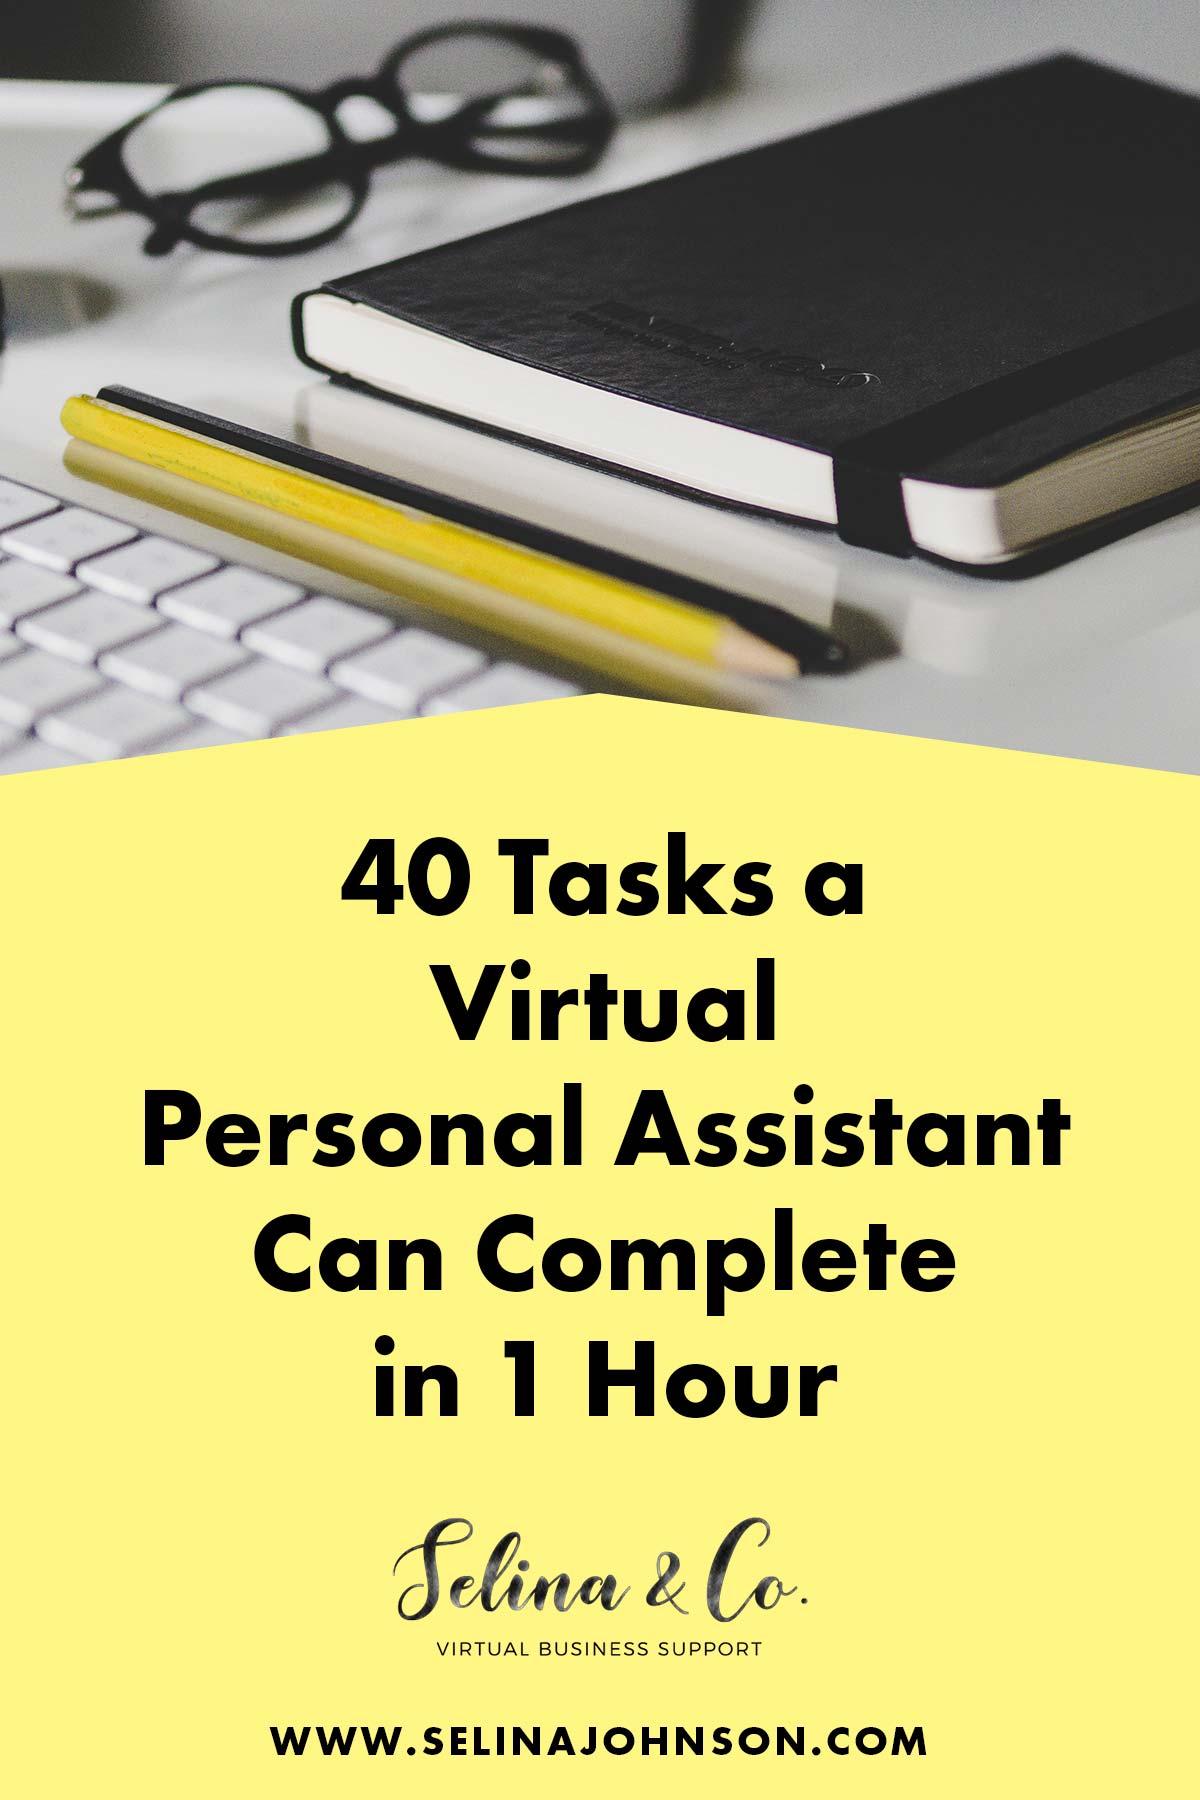 40-tasks-virtual-assistant.jpg